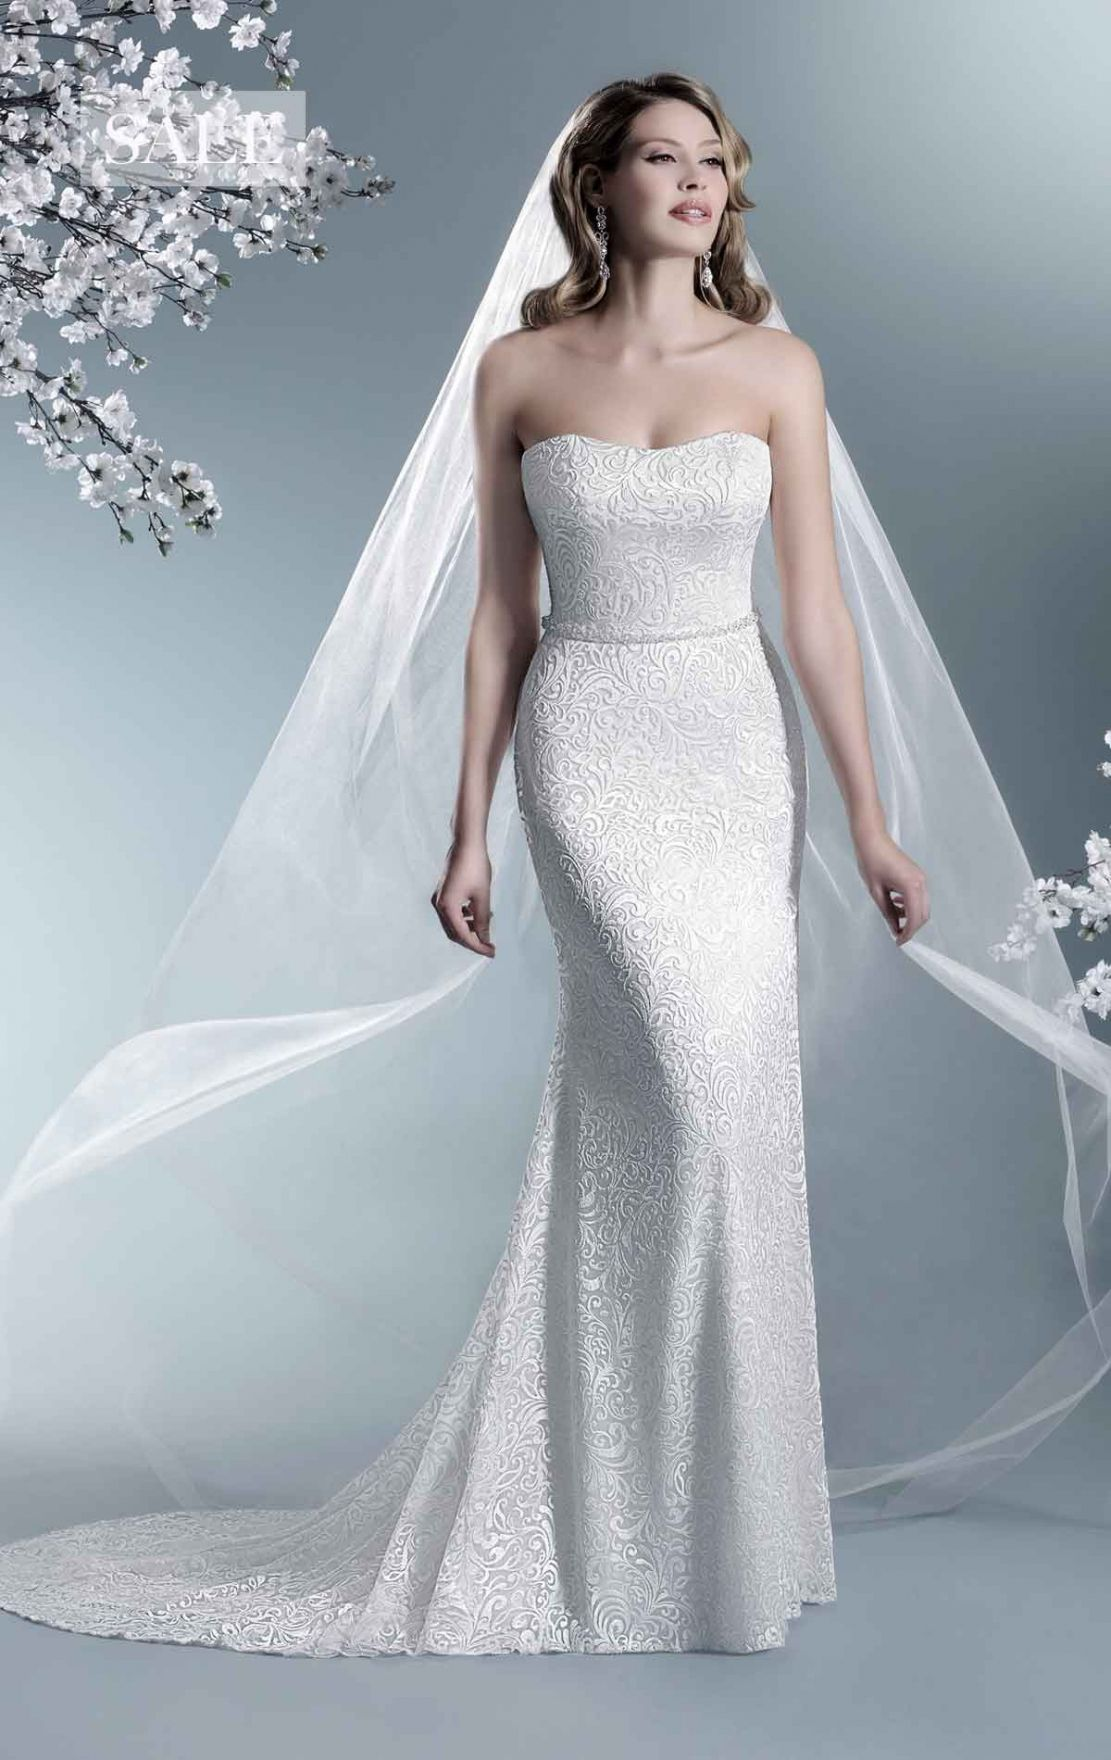 100+ Sample Wedding Dress Sales - Best Dresses for Wedding Check ...